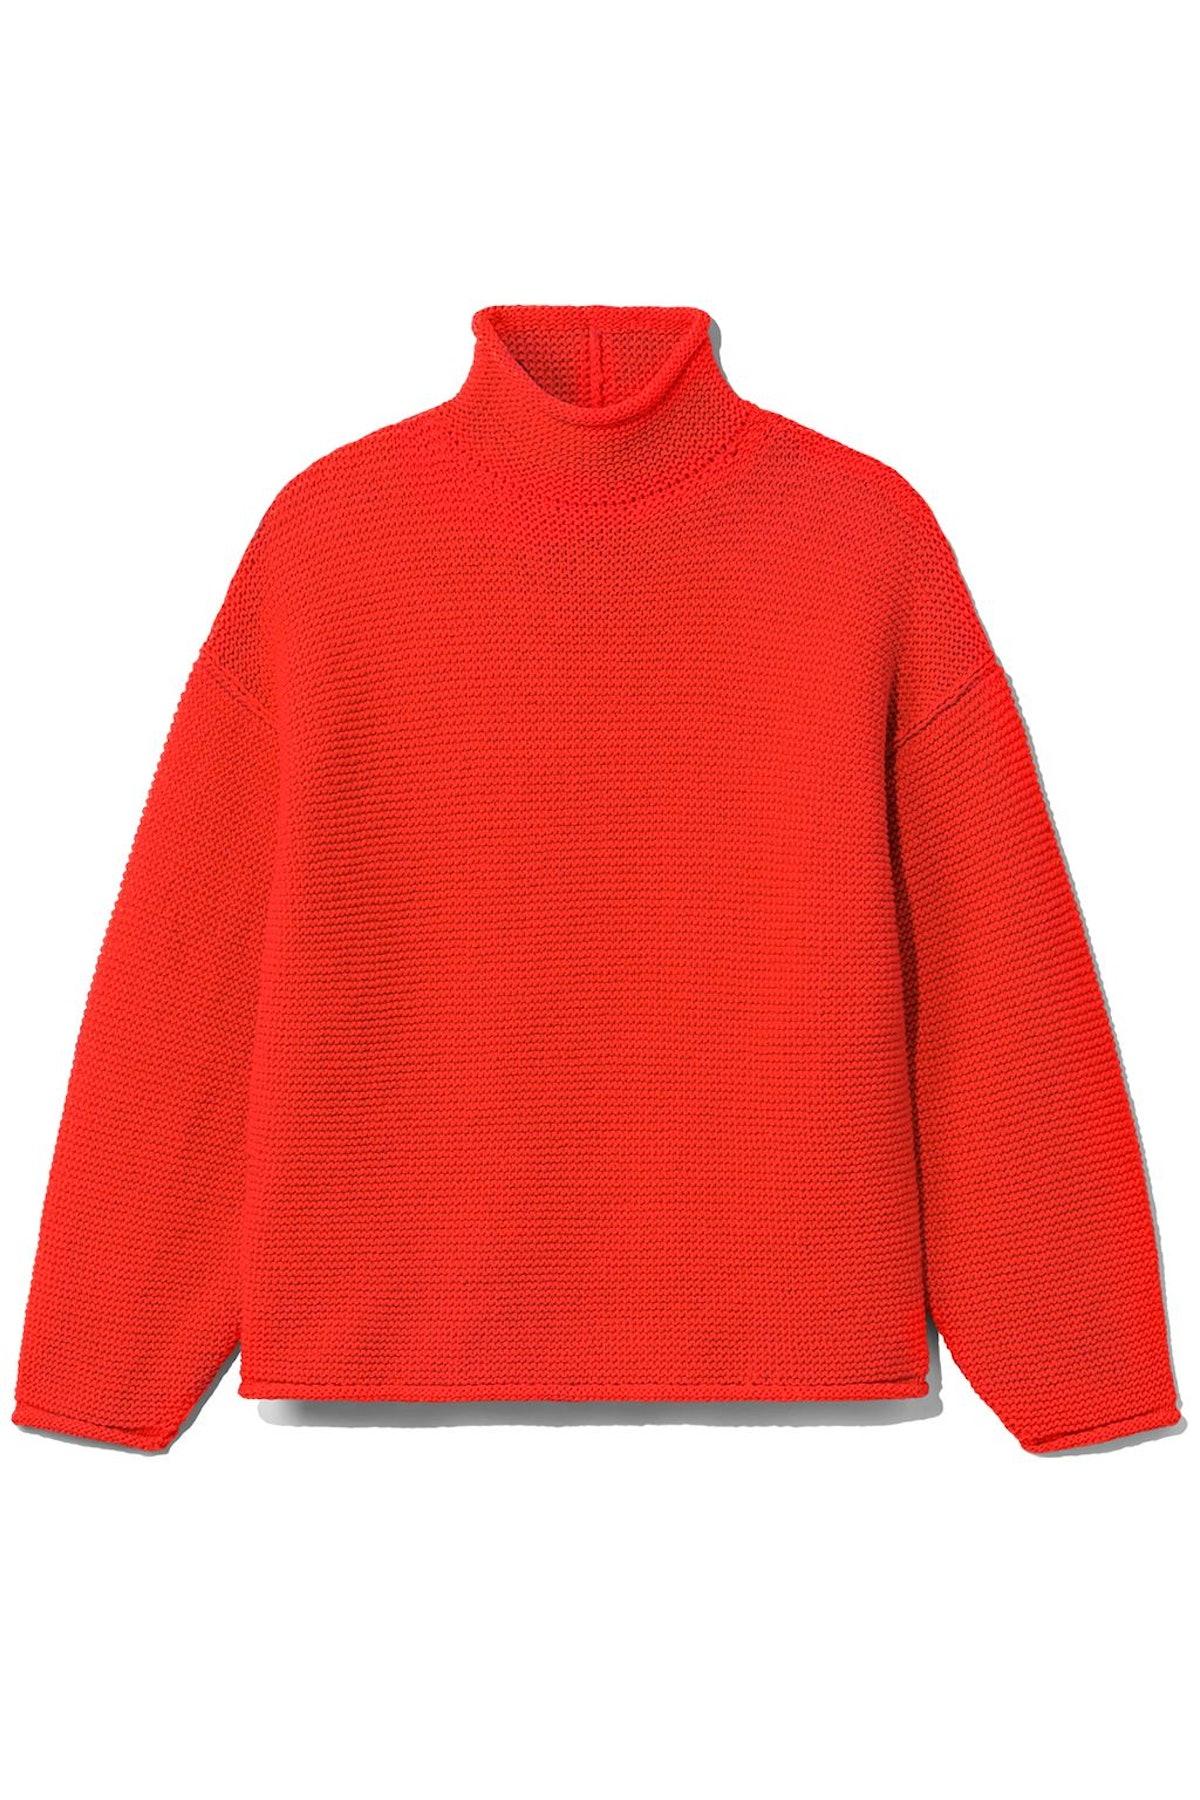 Cotton Turtleneck Sweater in Orange: image 1